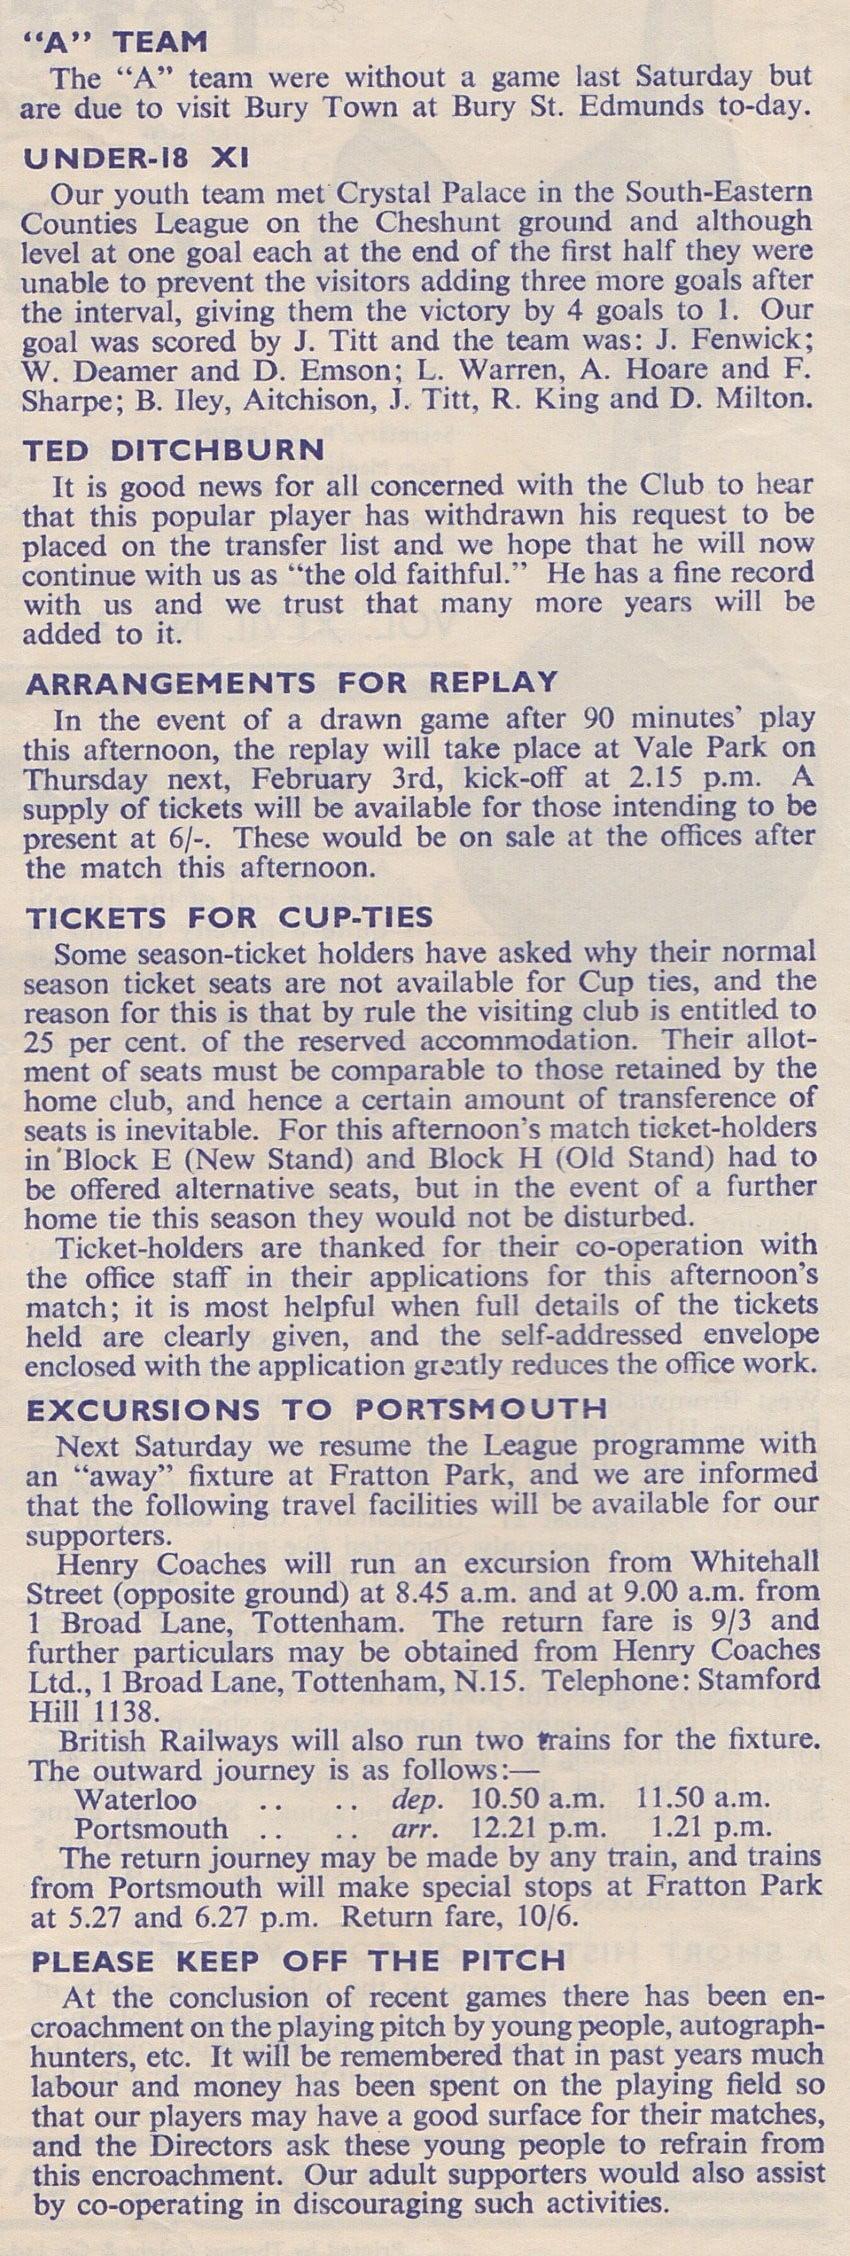 Tottenham Hotspur v Port Vale programme 1955 - inside page 2 detail